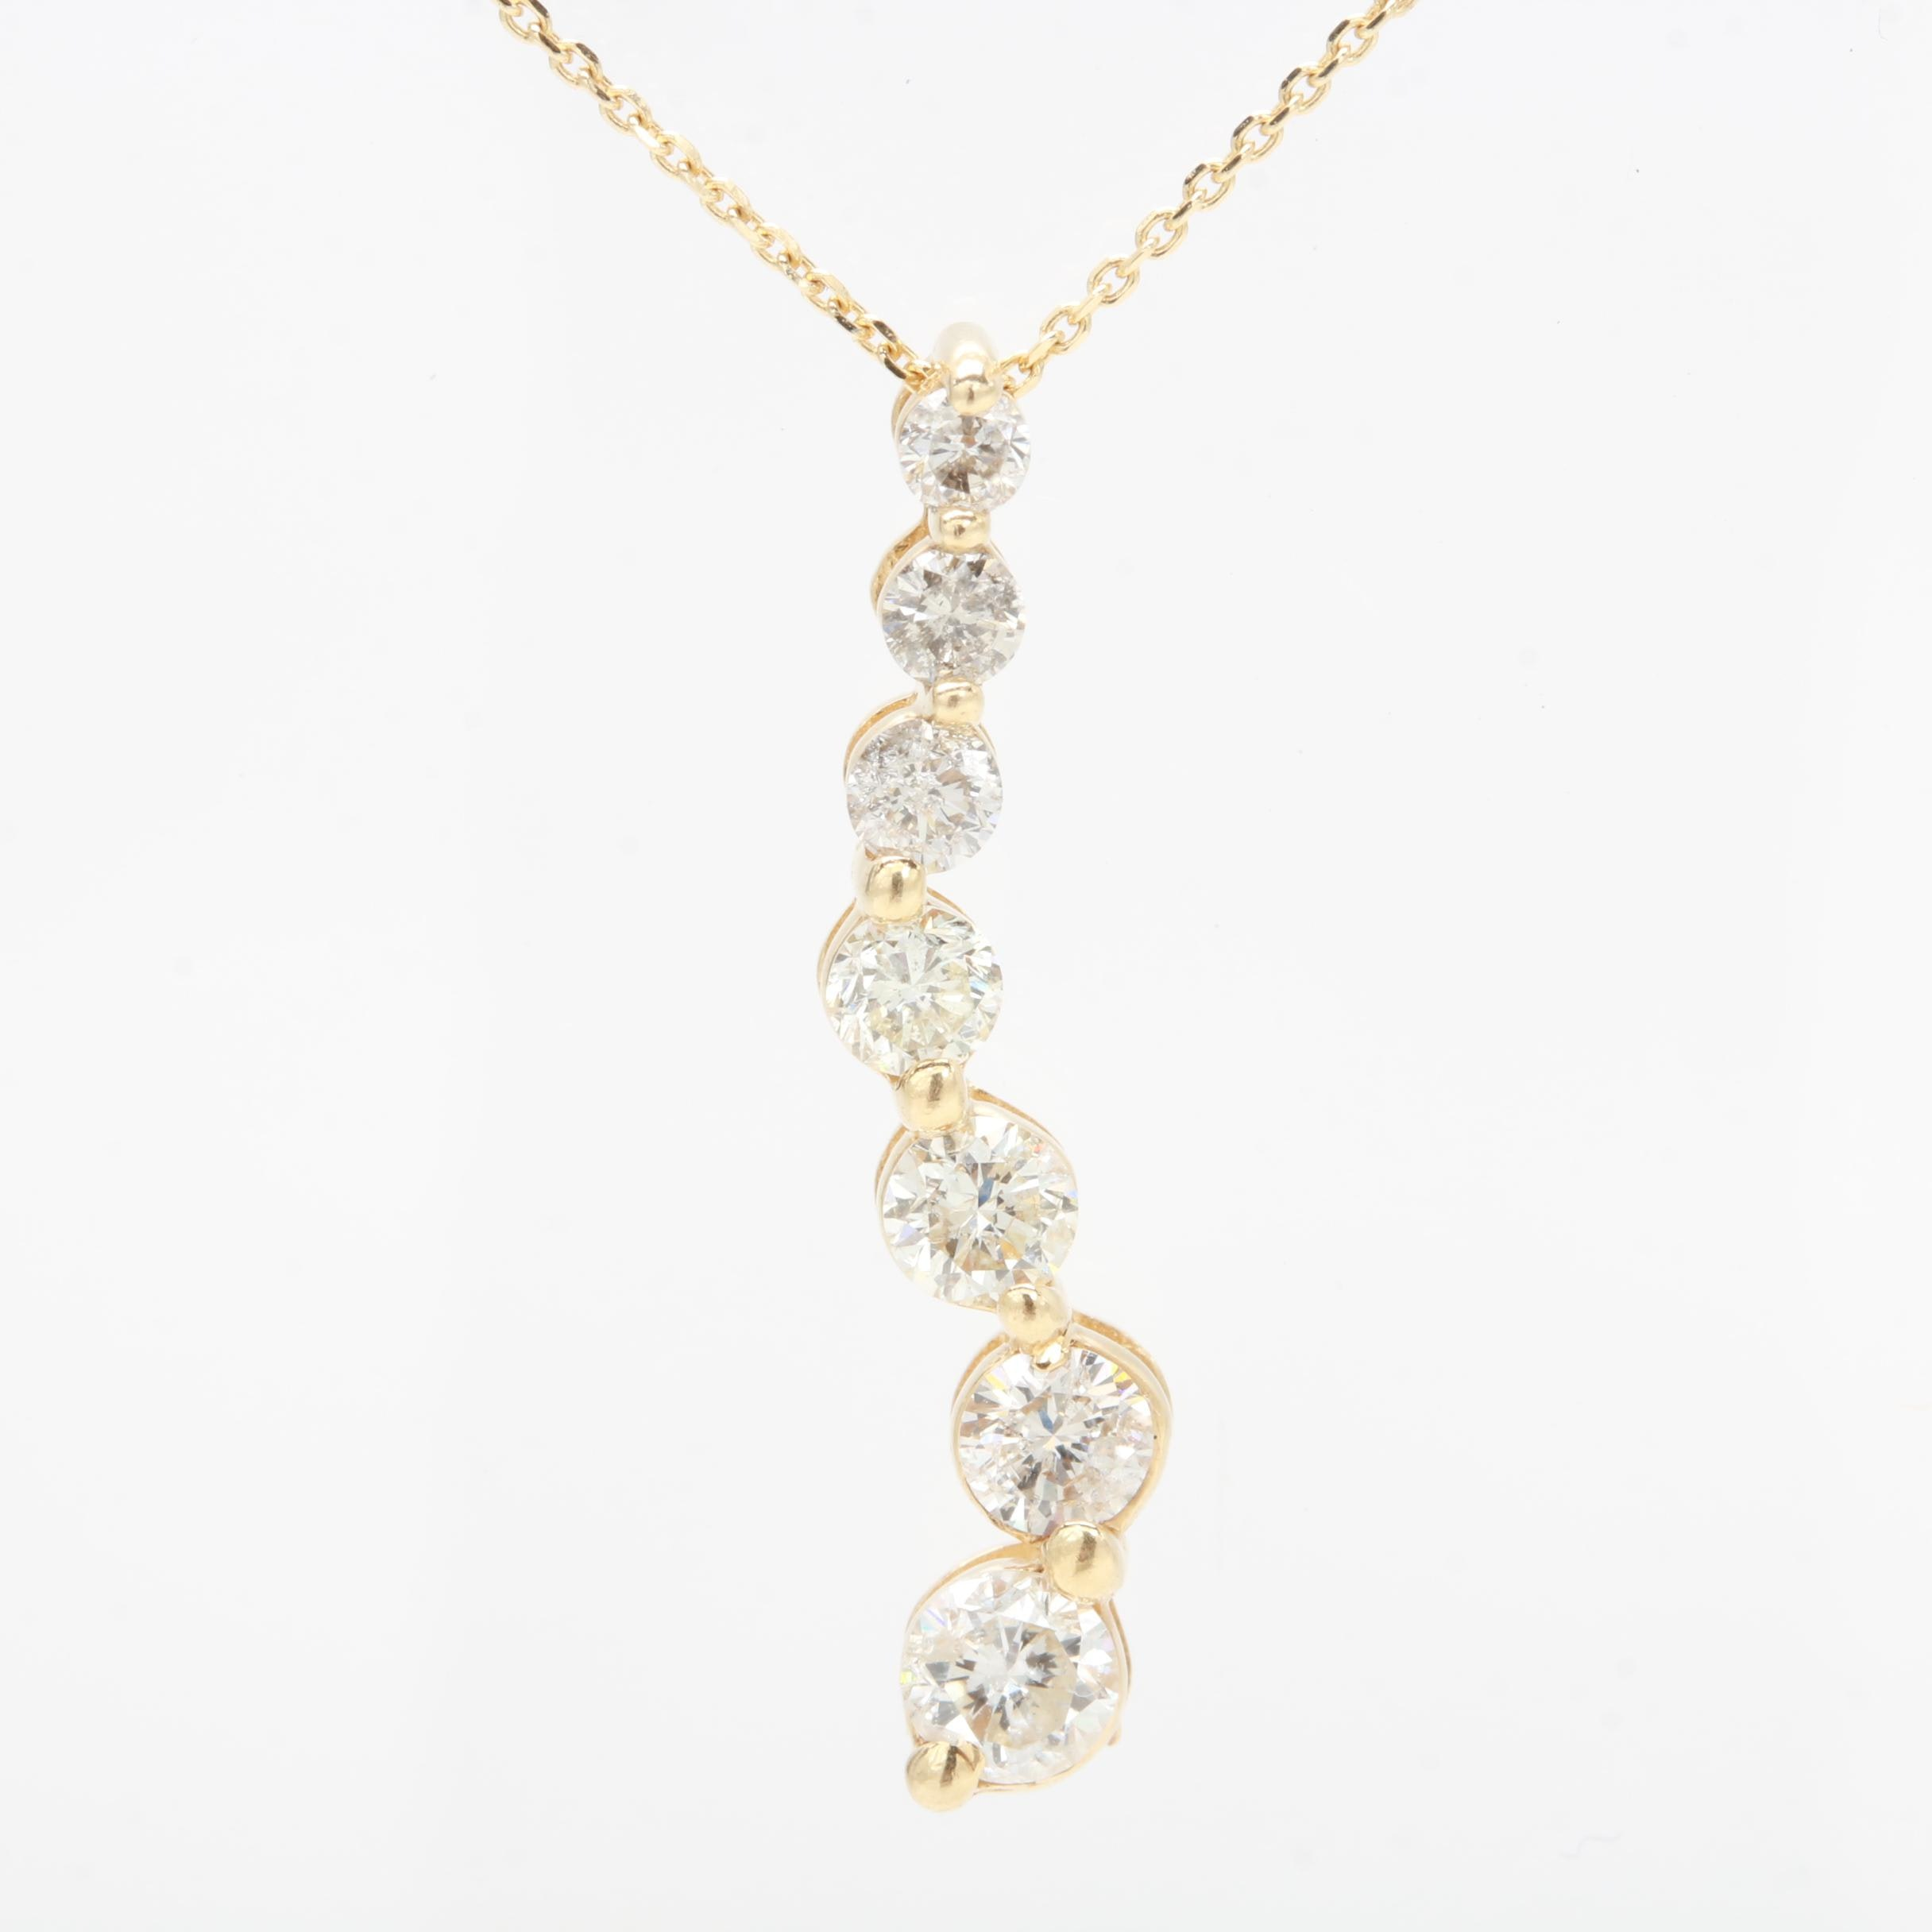 14K Yellow Gold Diamond Journey Pendant Necklace